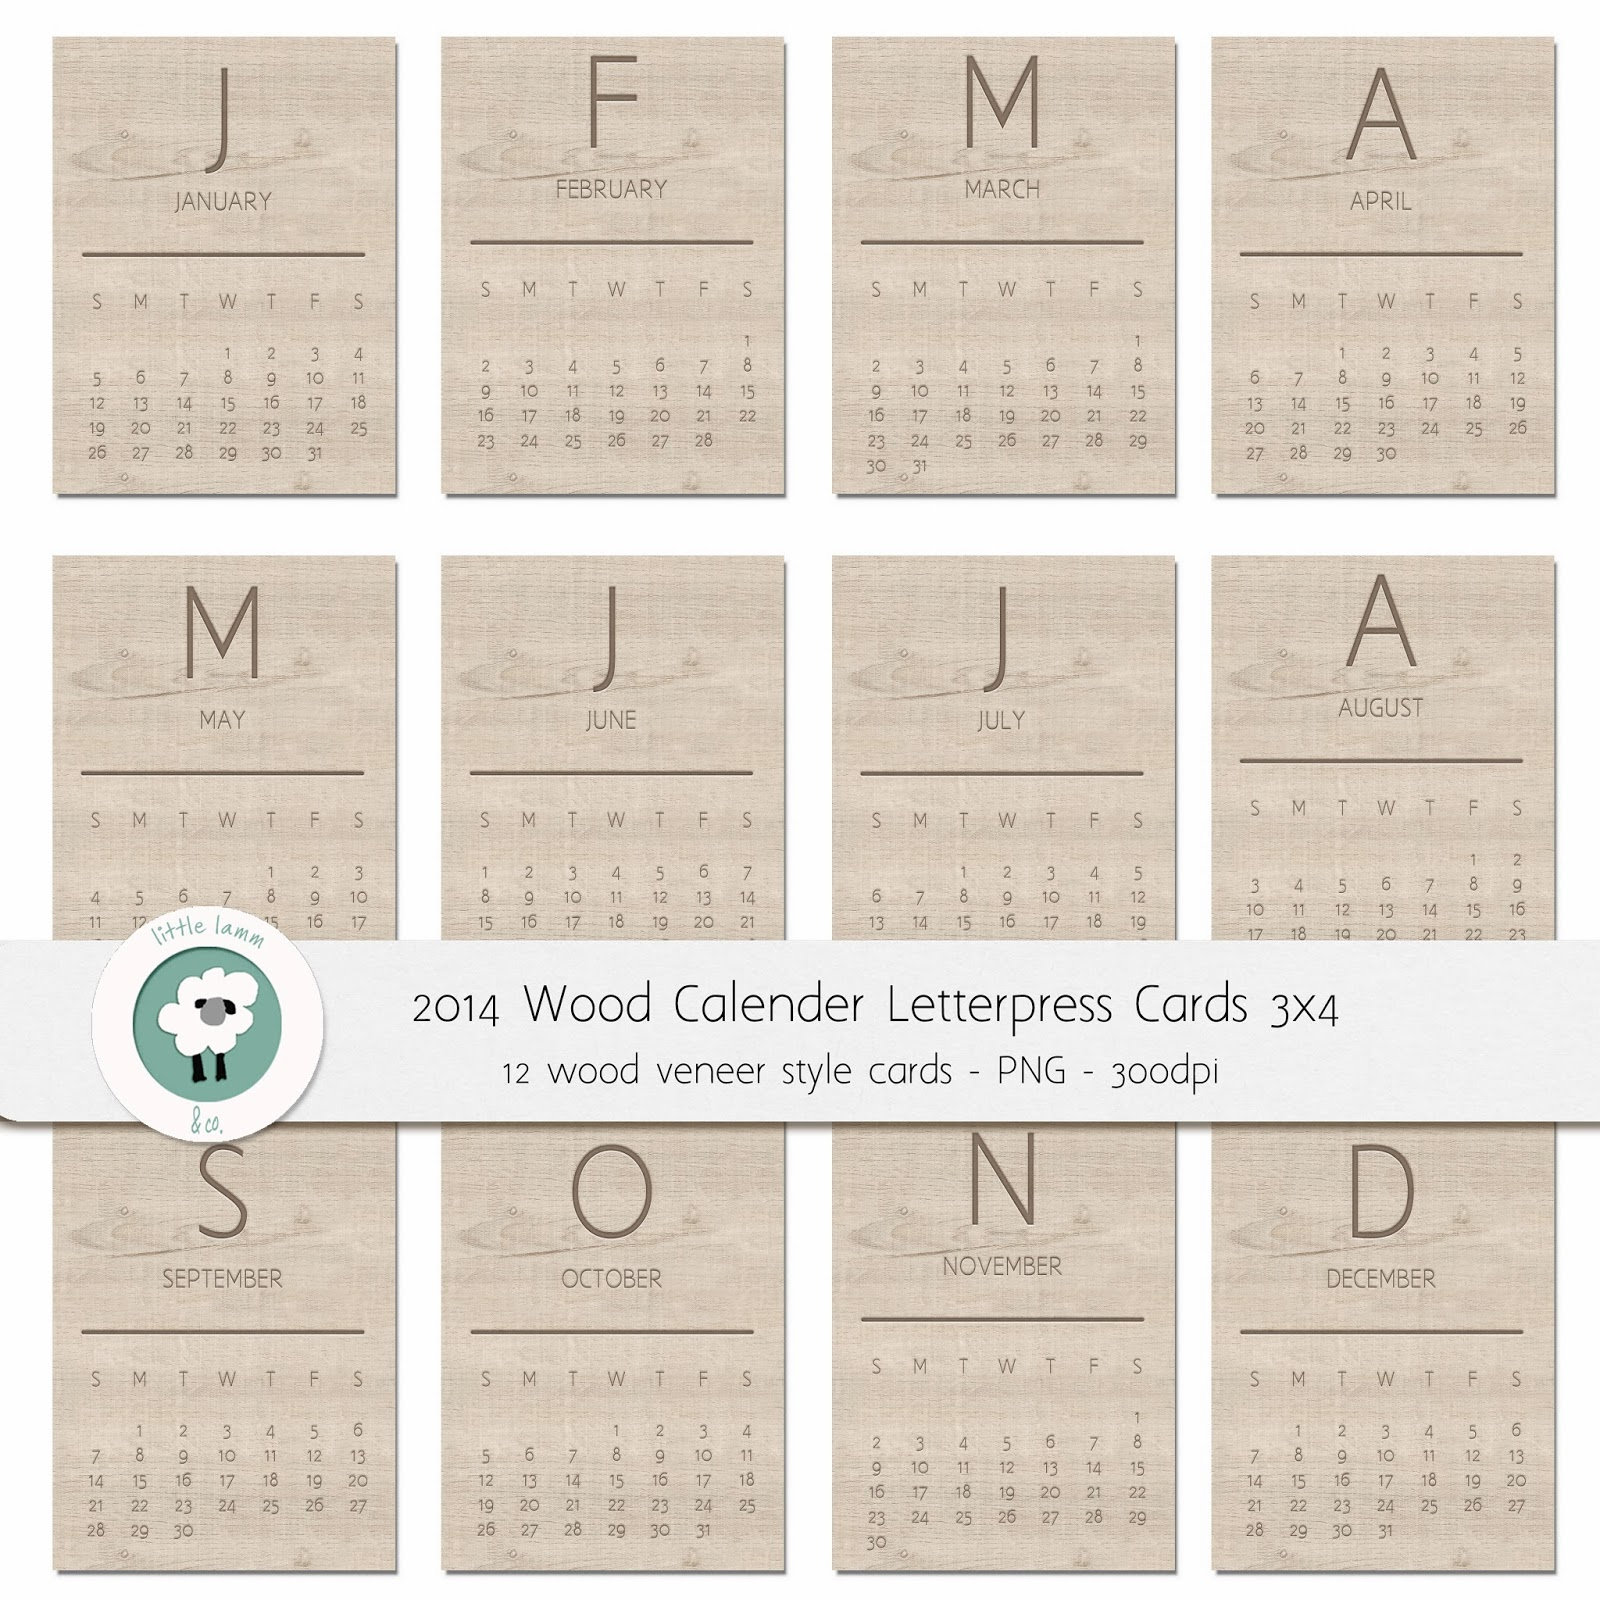 https://www.etsy.com/listing/165660903/little-lamm-co-digital-2014-wood-veneer?